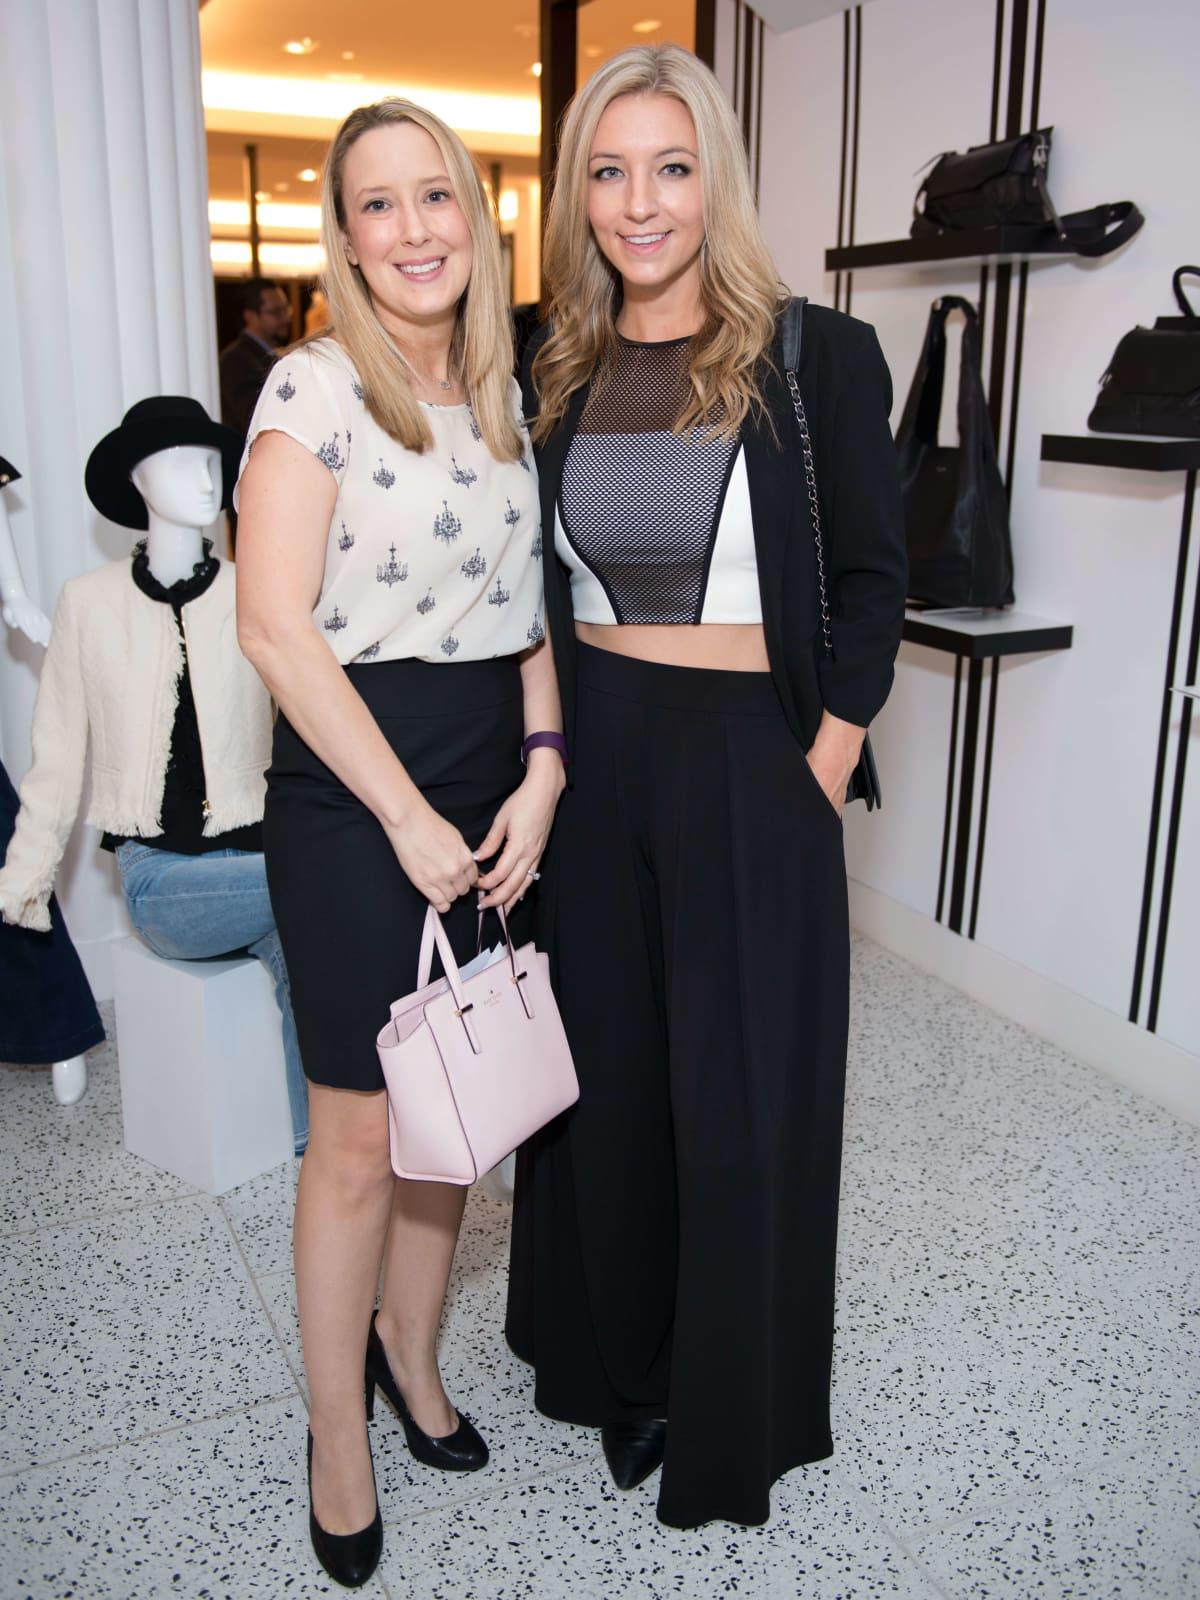 Fresh Faces of Fashion 8/16, Megan Hotze